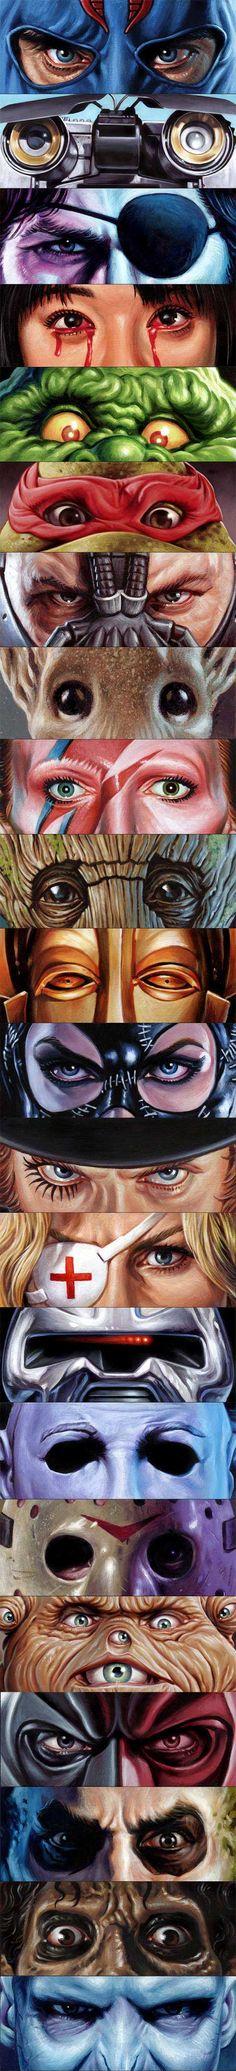 Eyes without a face art series By Jason-Edmiston via geektyrant.com